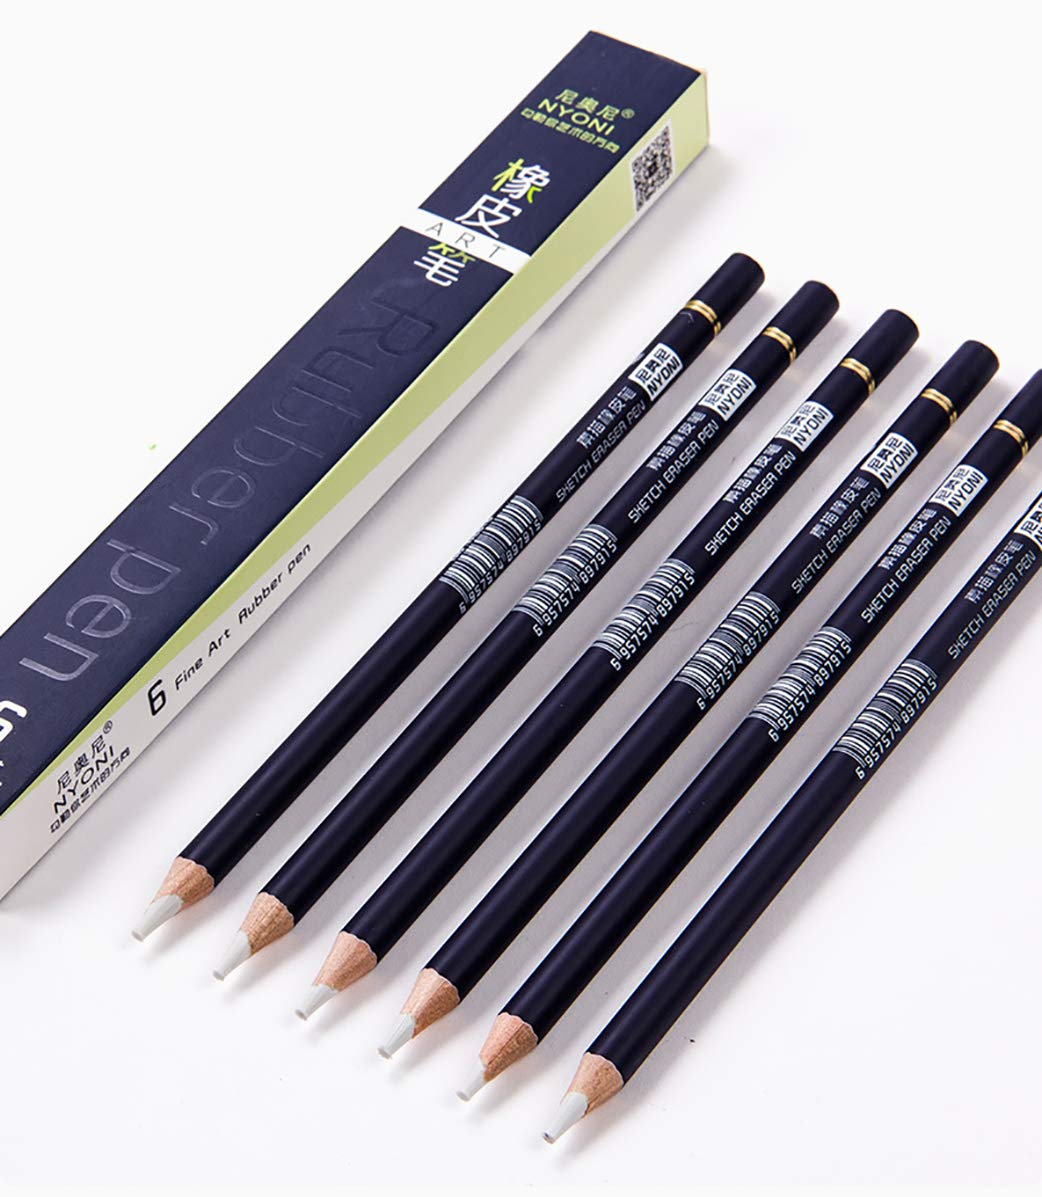 Sketch Eraser Pen-Style Erasers Pen Shape Eraser Highlight Erasers Erasers pen Rubber Pen 6 Pack by Kachikawa (Image #1)